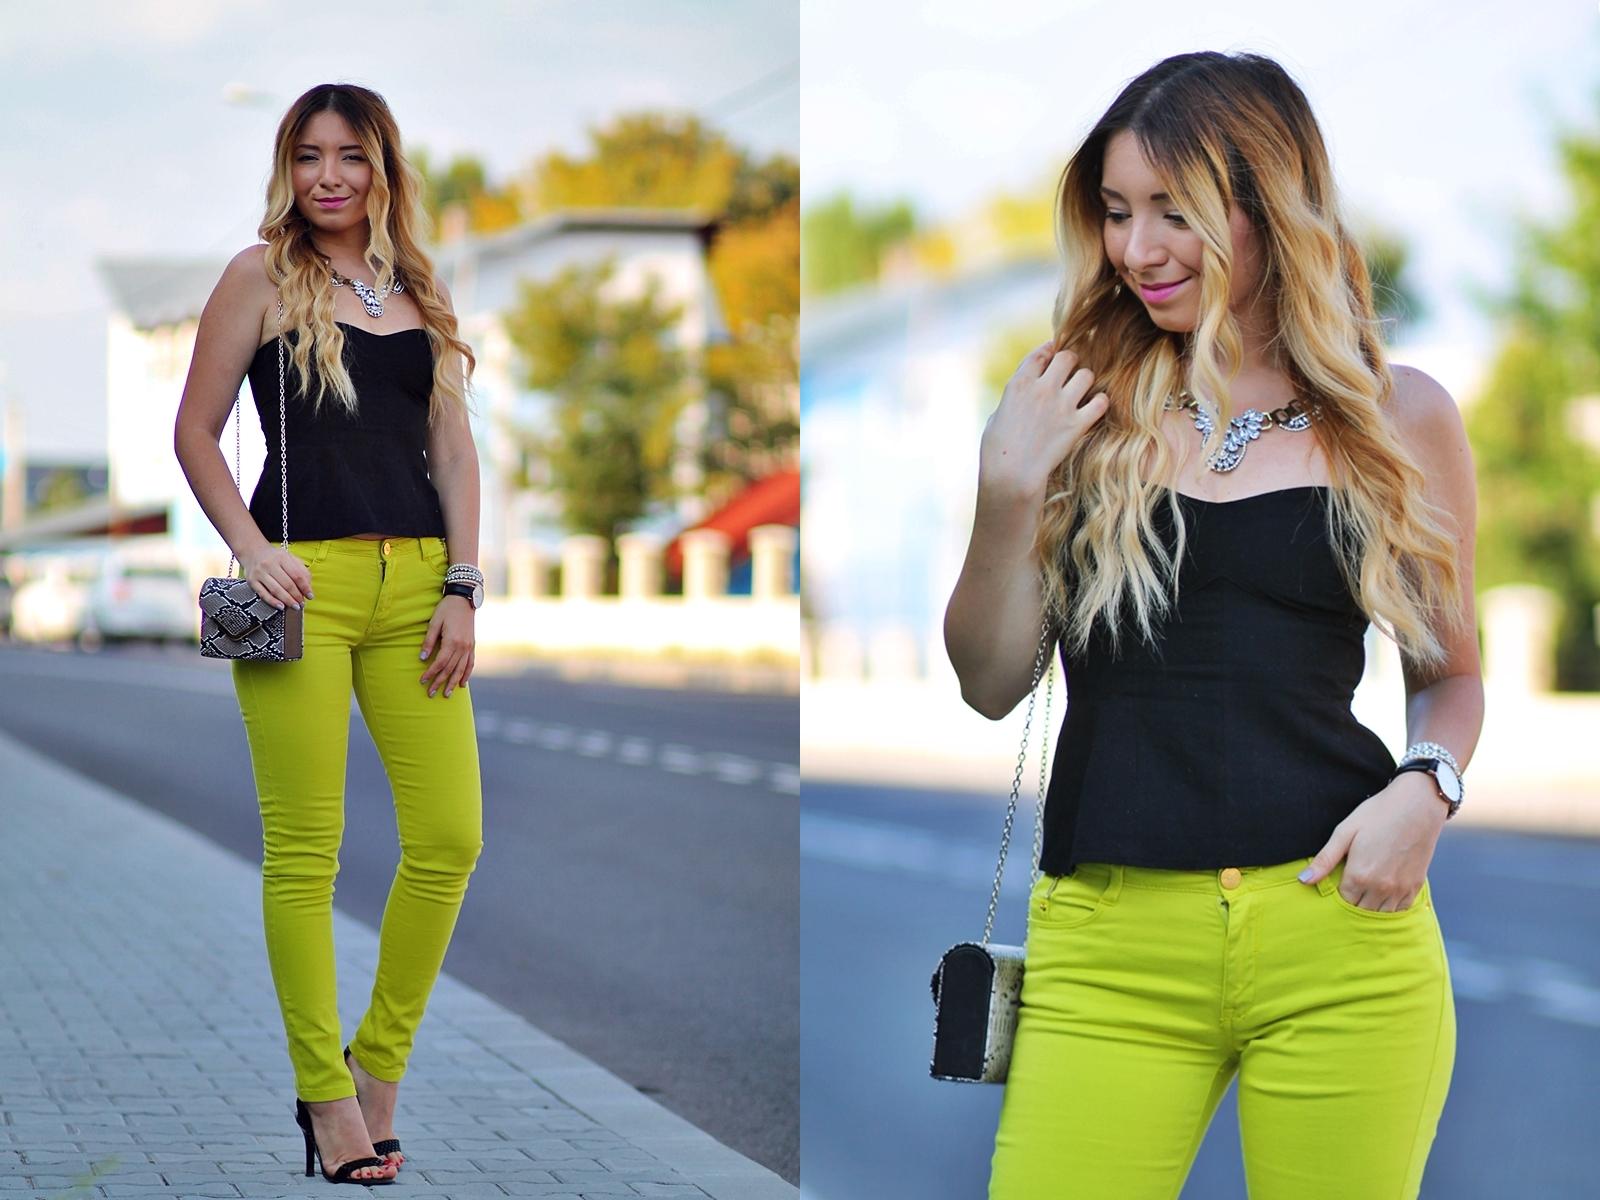 lookbook - light green pants and black top